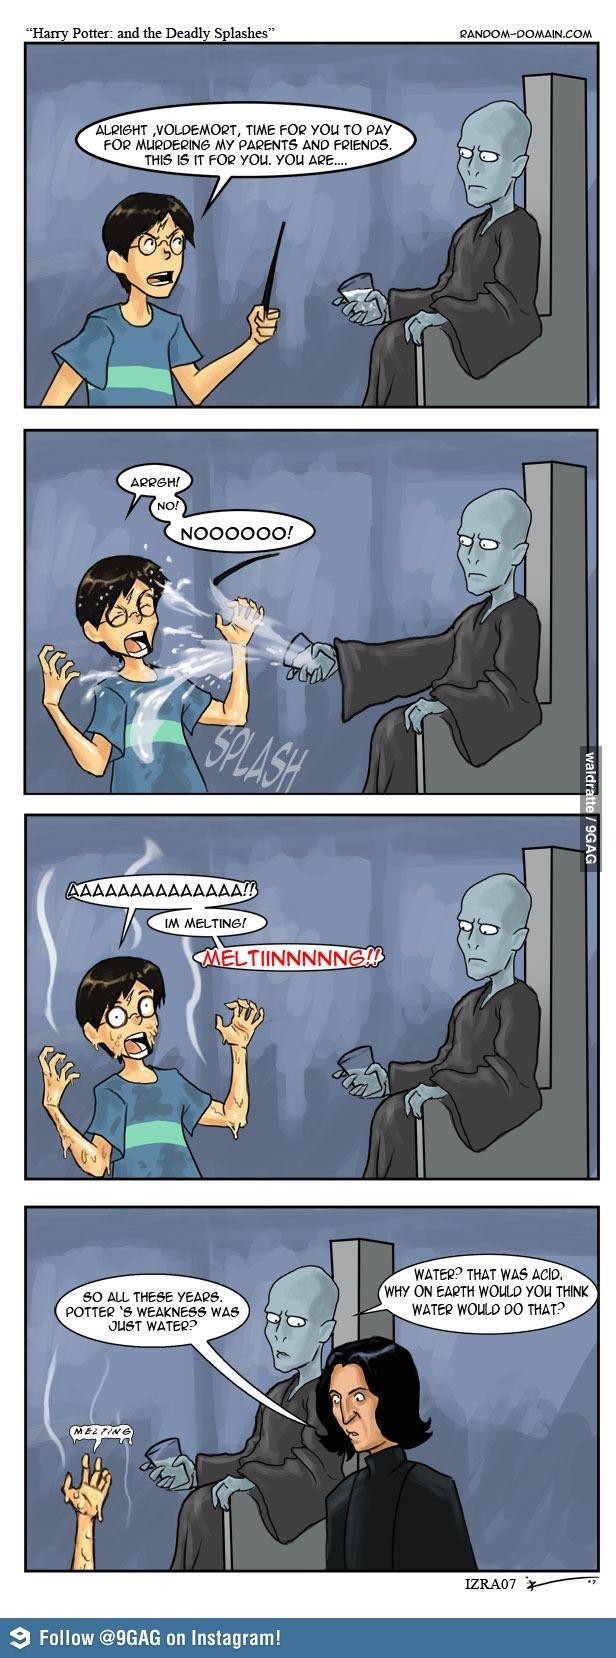 The secret of Harry Potter's weakness revealed!! Hahaha!